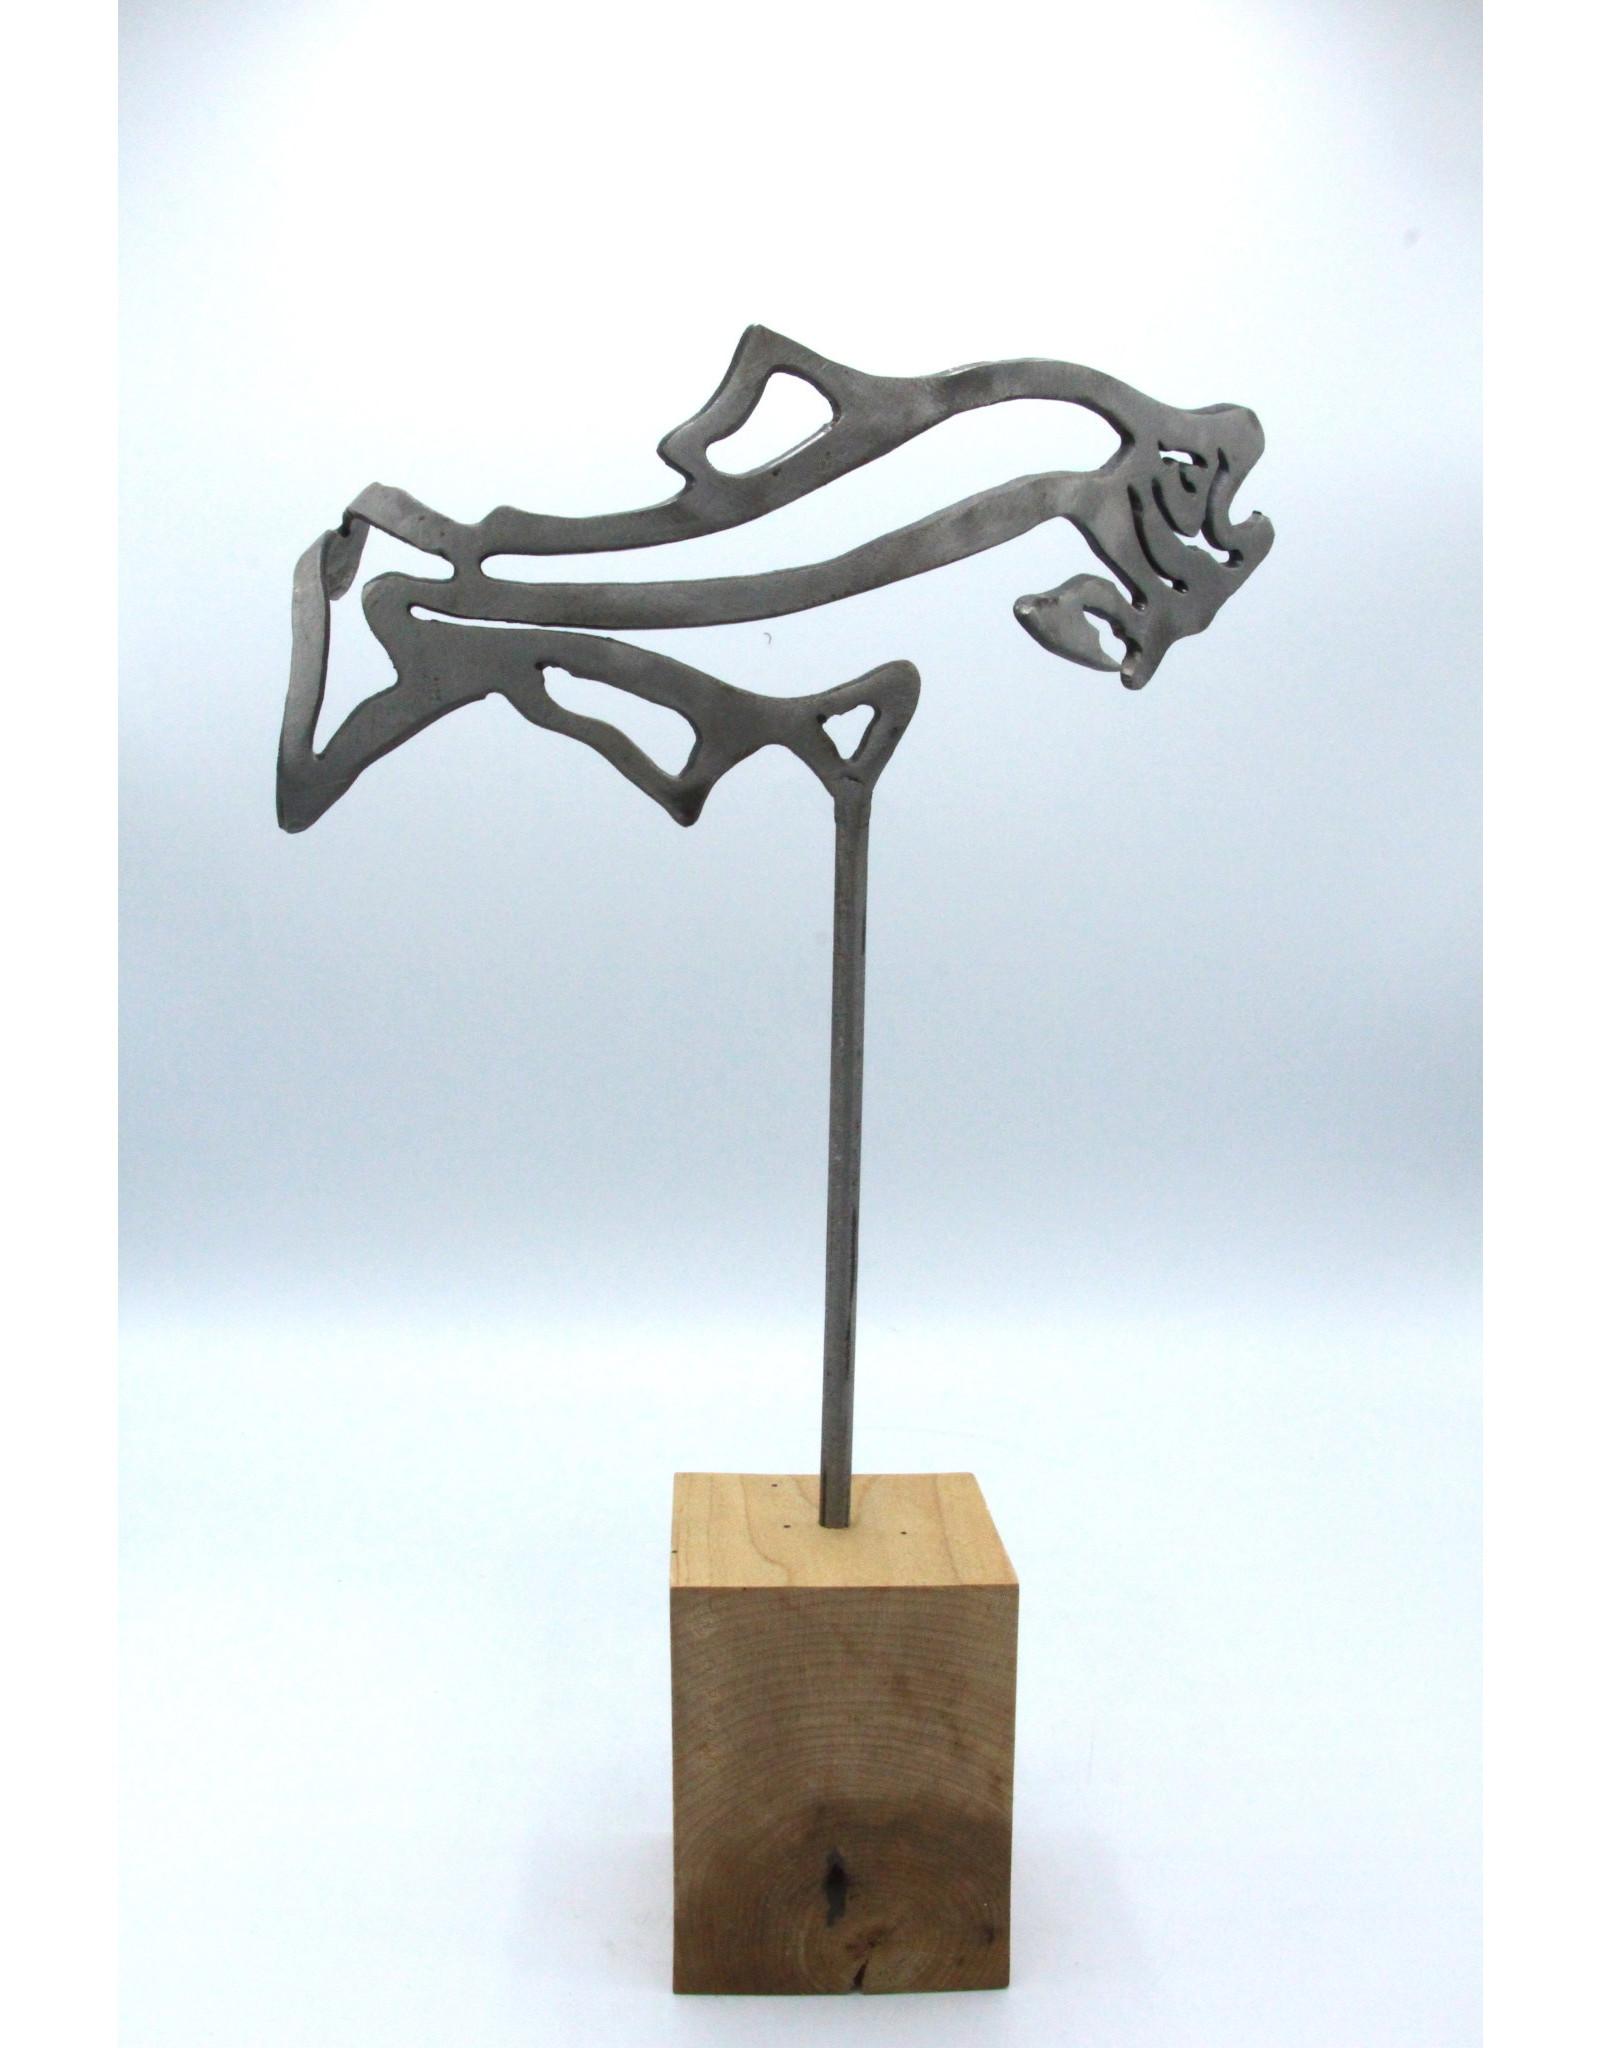 Metal Sculpture - Small Fish